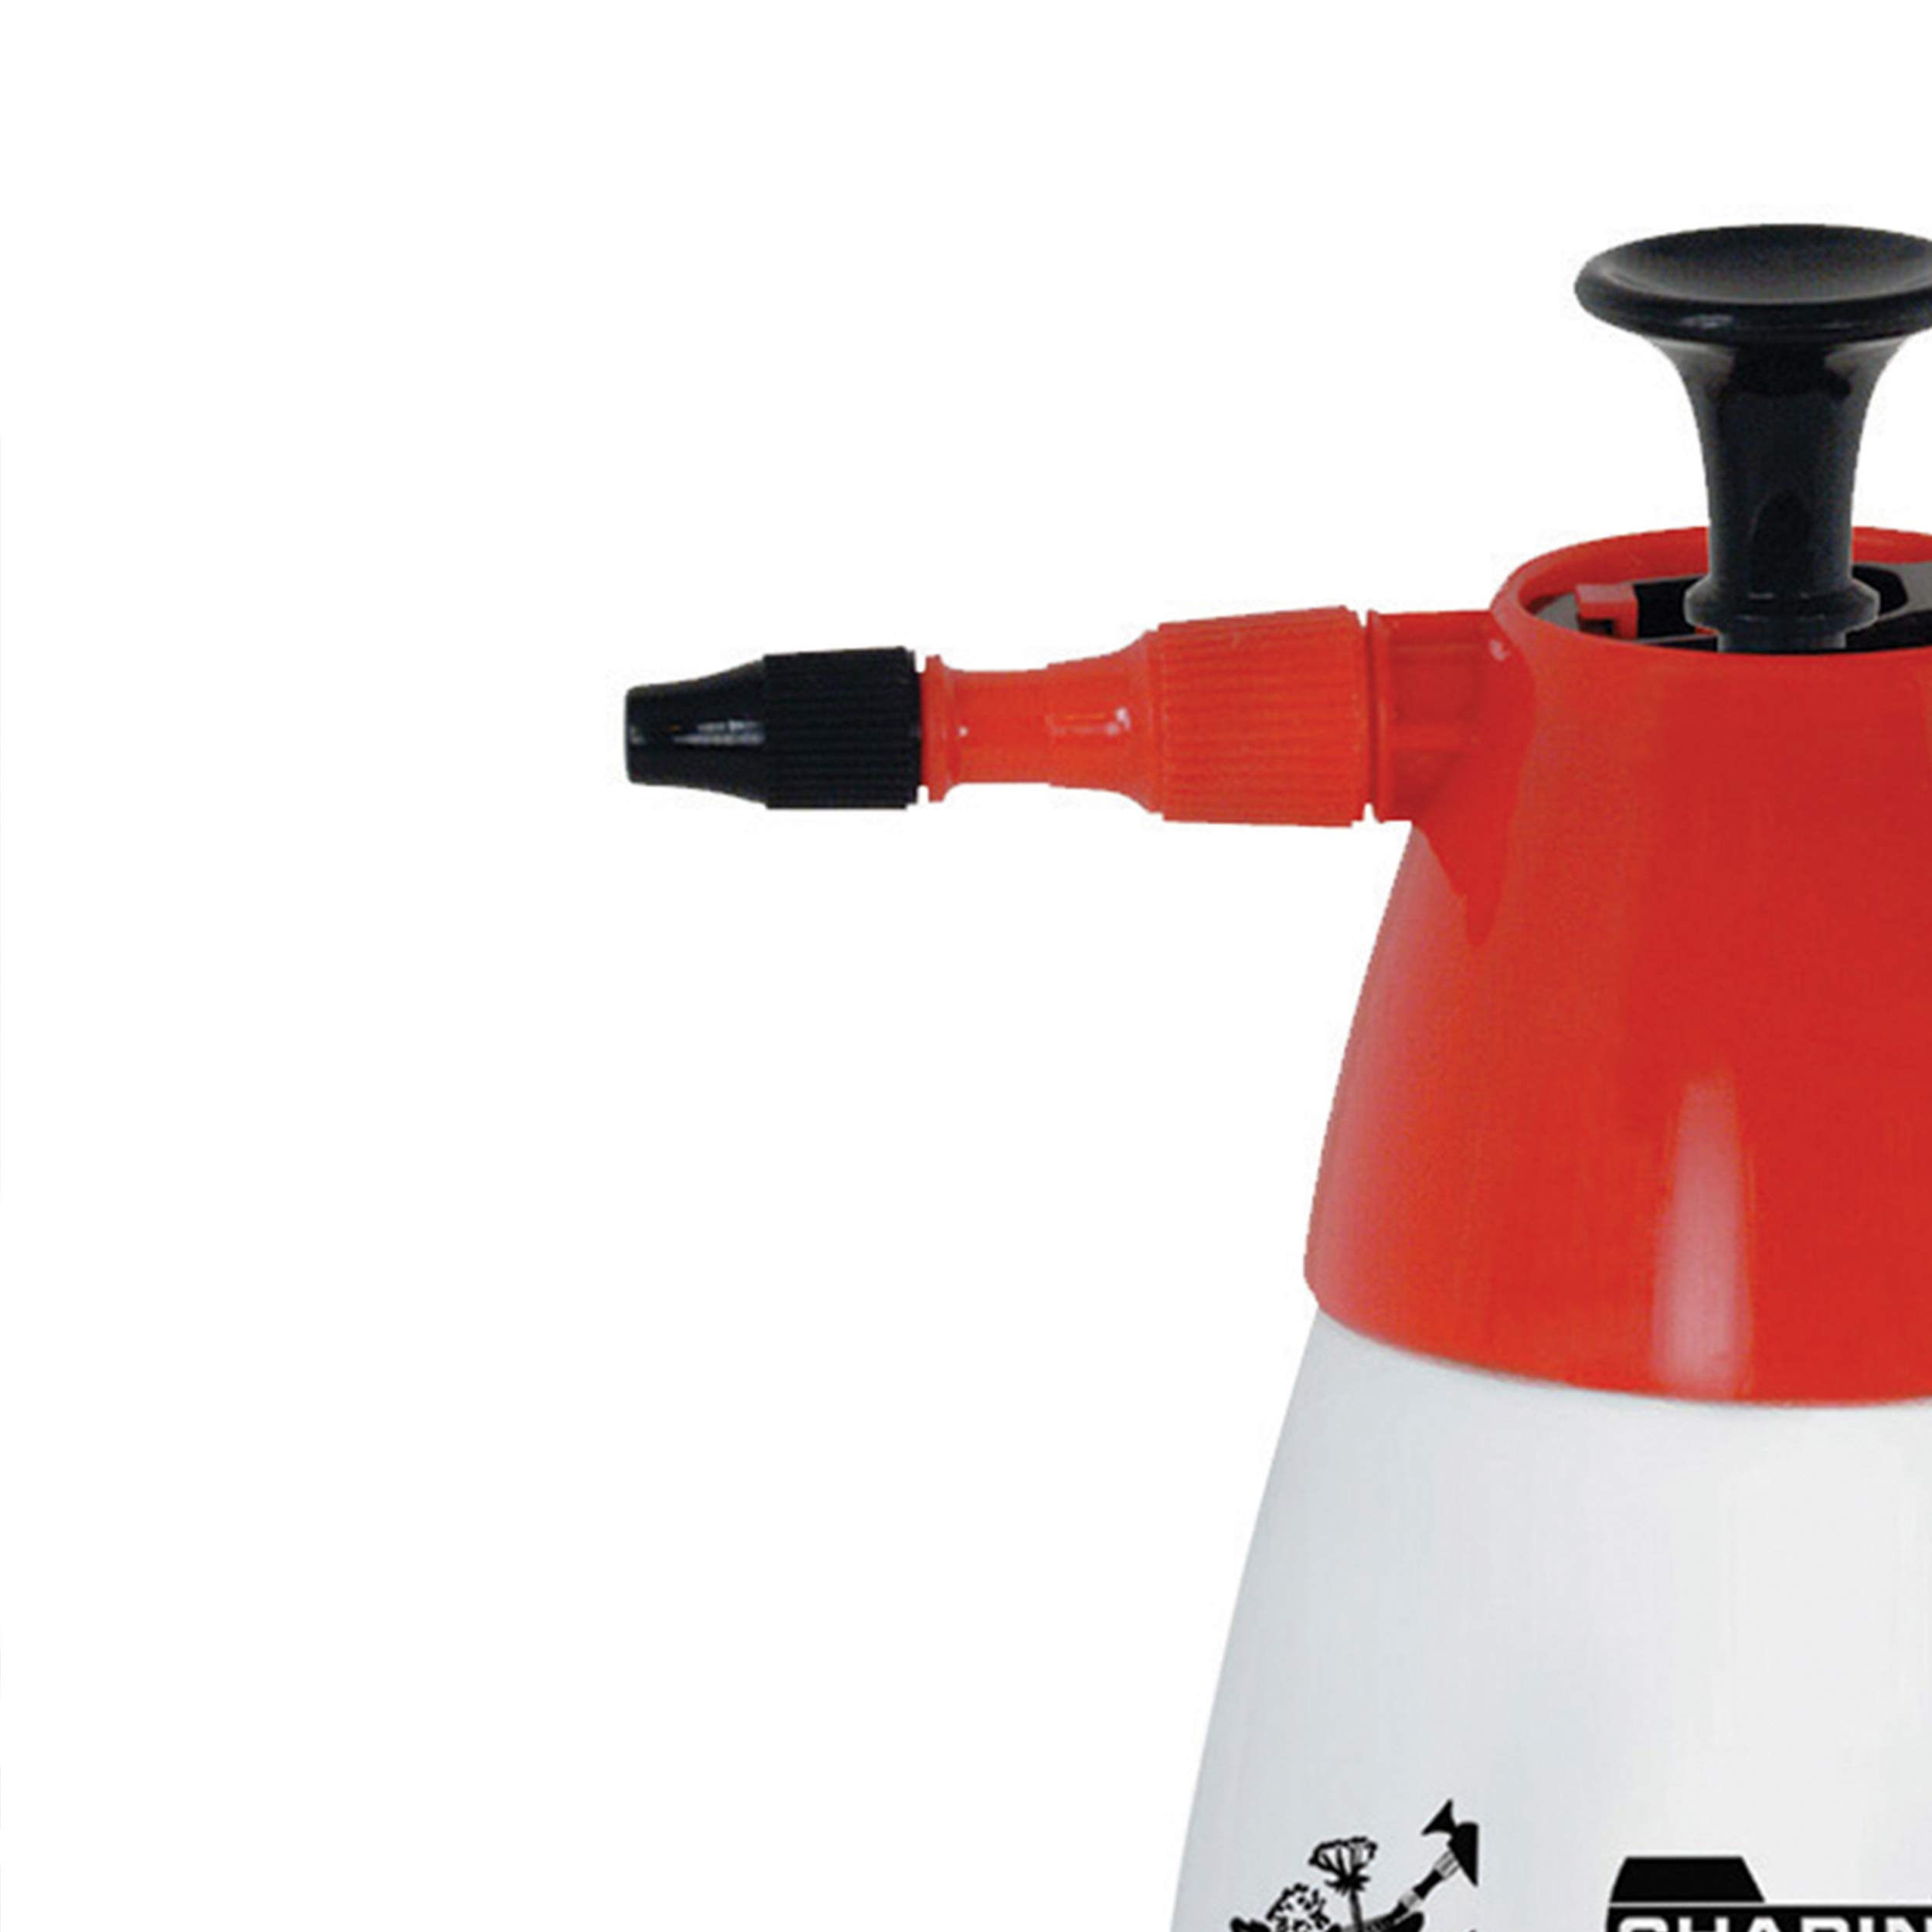 Chapin International 1002 48-Oz Multi-Purpose Sprayer, Red/White, Fine to Coarse Spray